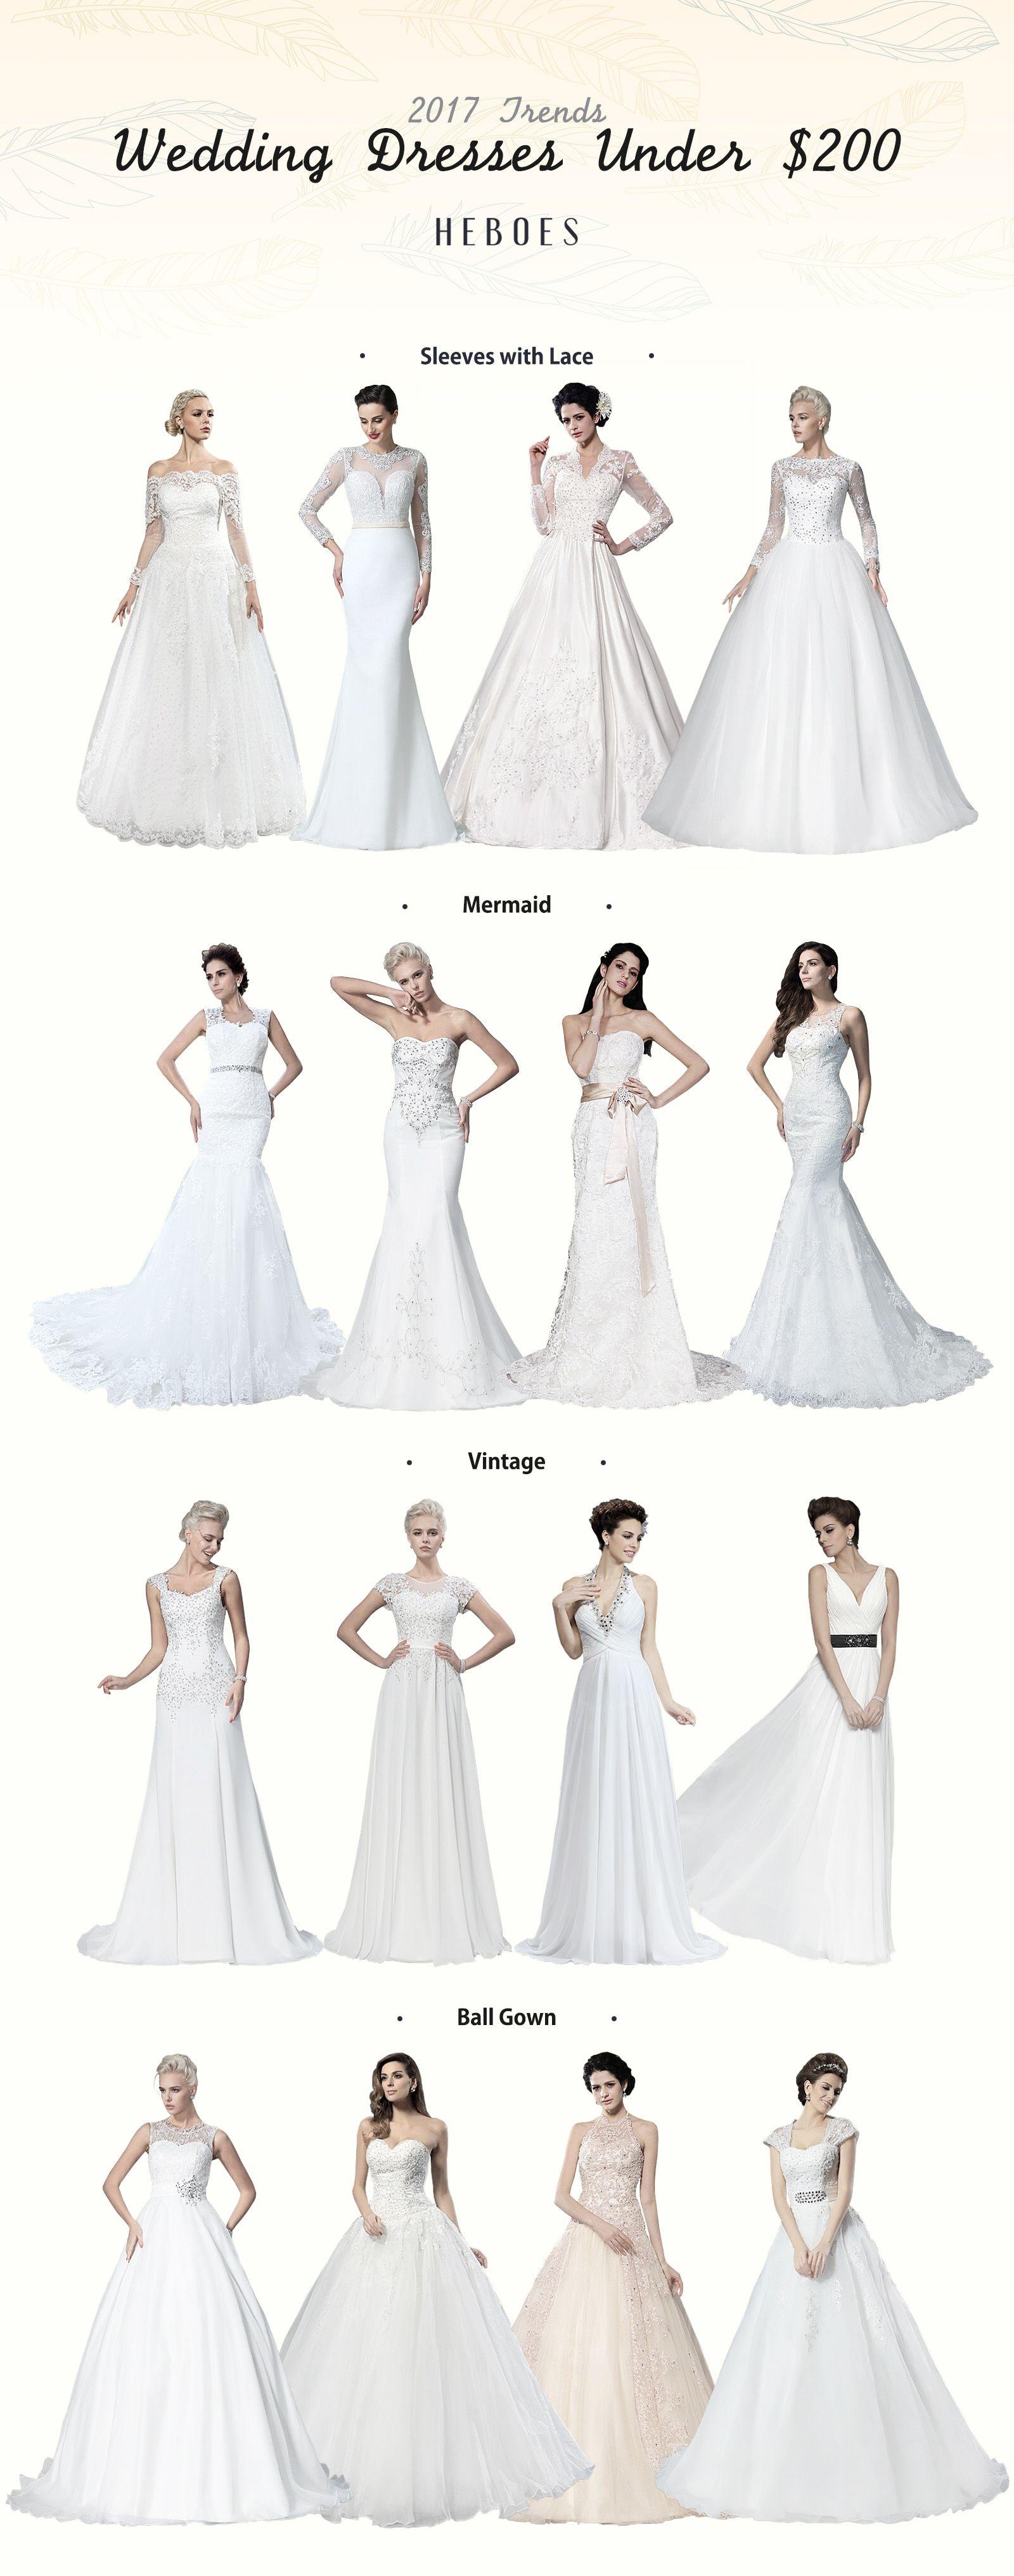 Wedding Dresses Online Buy Cheap Wedding Dresses For Bride Hebeos Cheap Wedding Dress Wedding Dresses 2017 Wedding Dresses